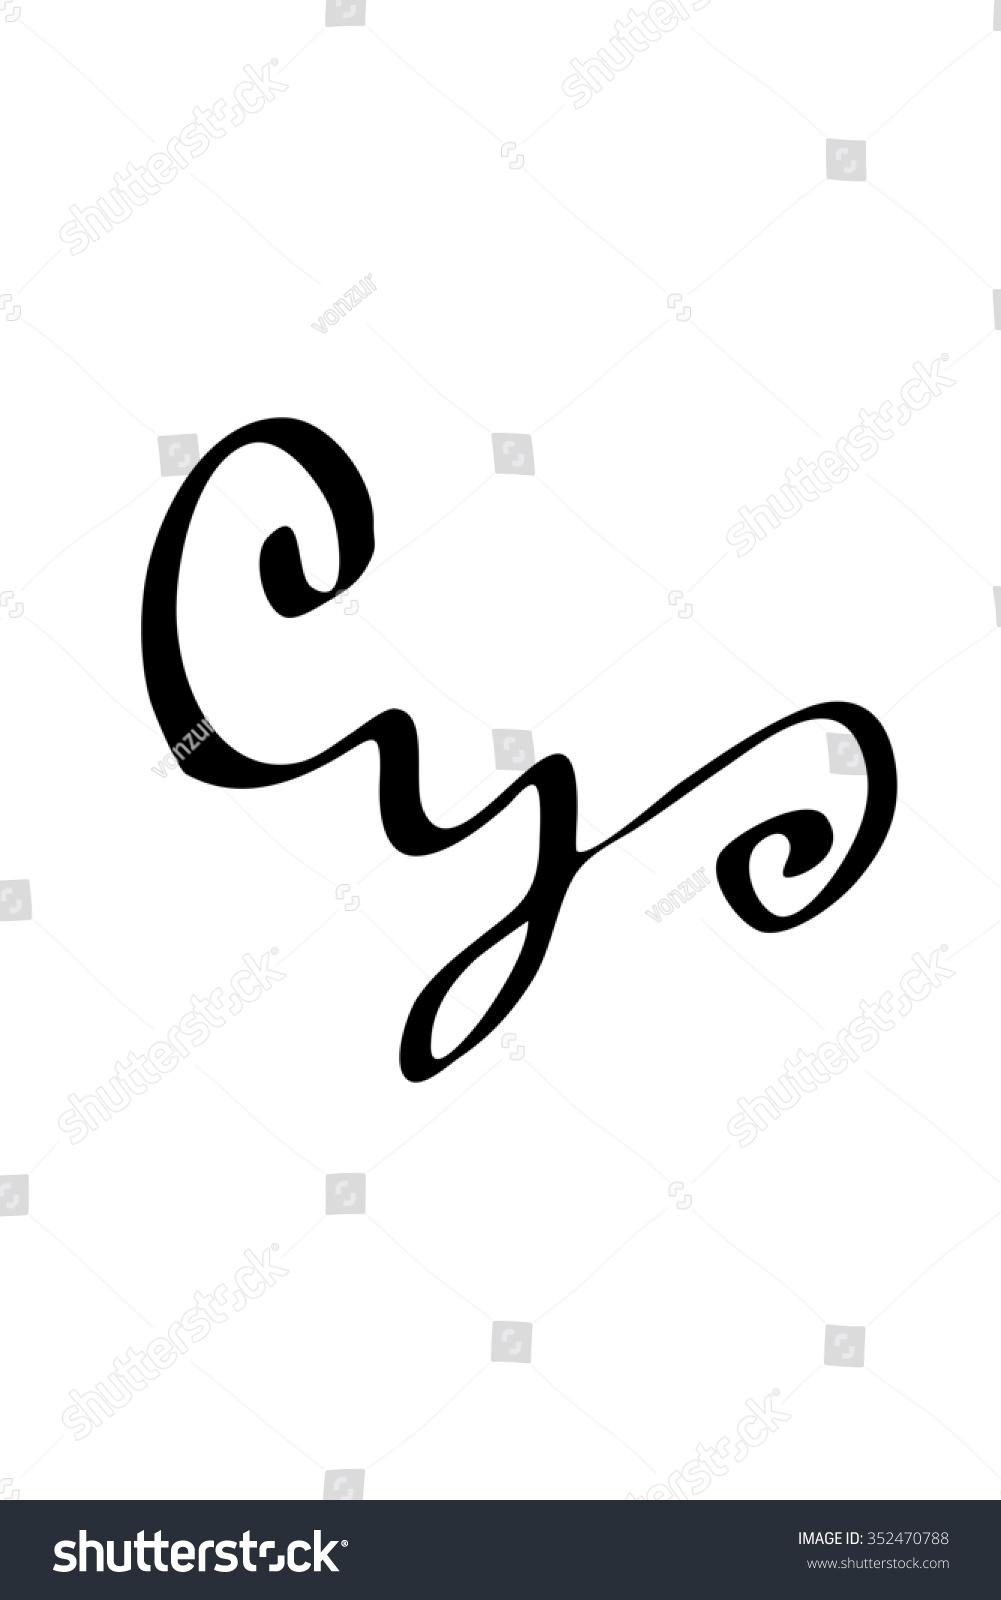 Zibu Symbols For Friendship 9310575 Bunkyofo